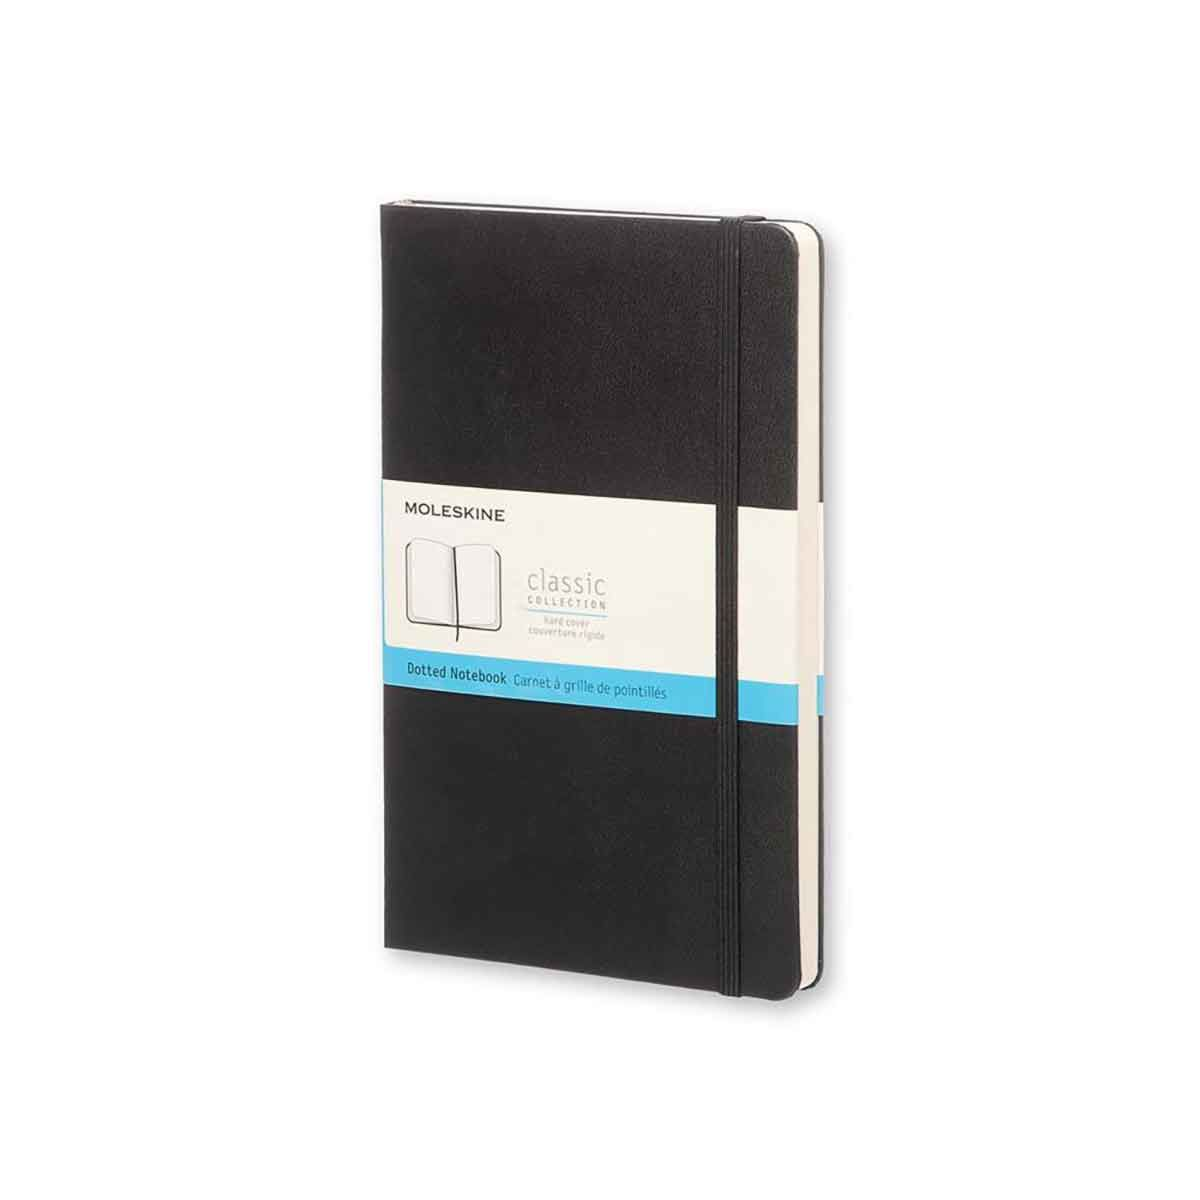 Moleskine Dotted Notebook Hardcover Large Black